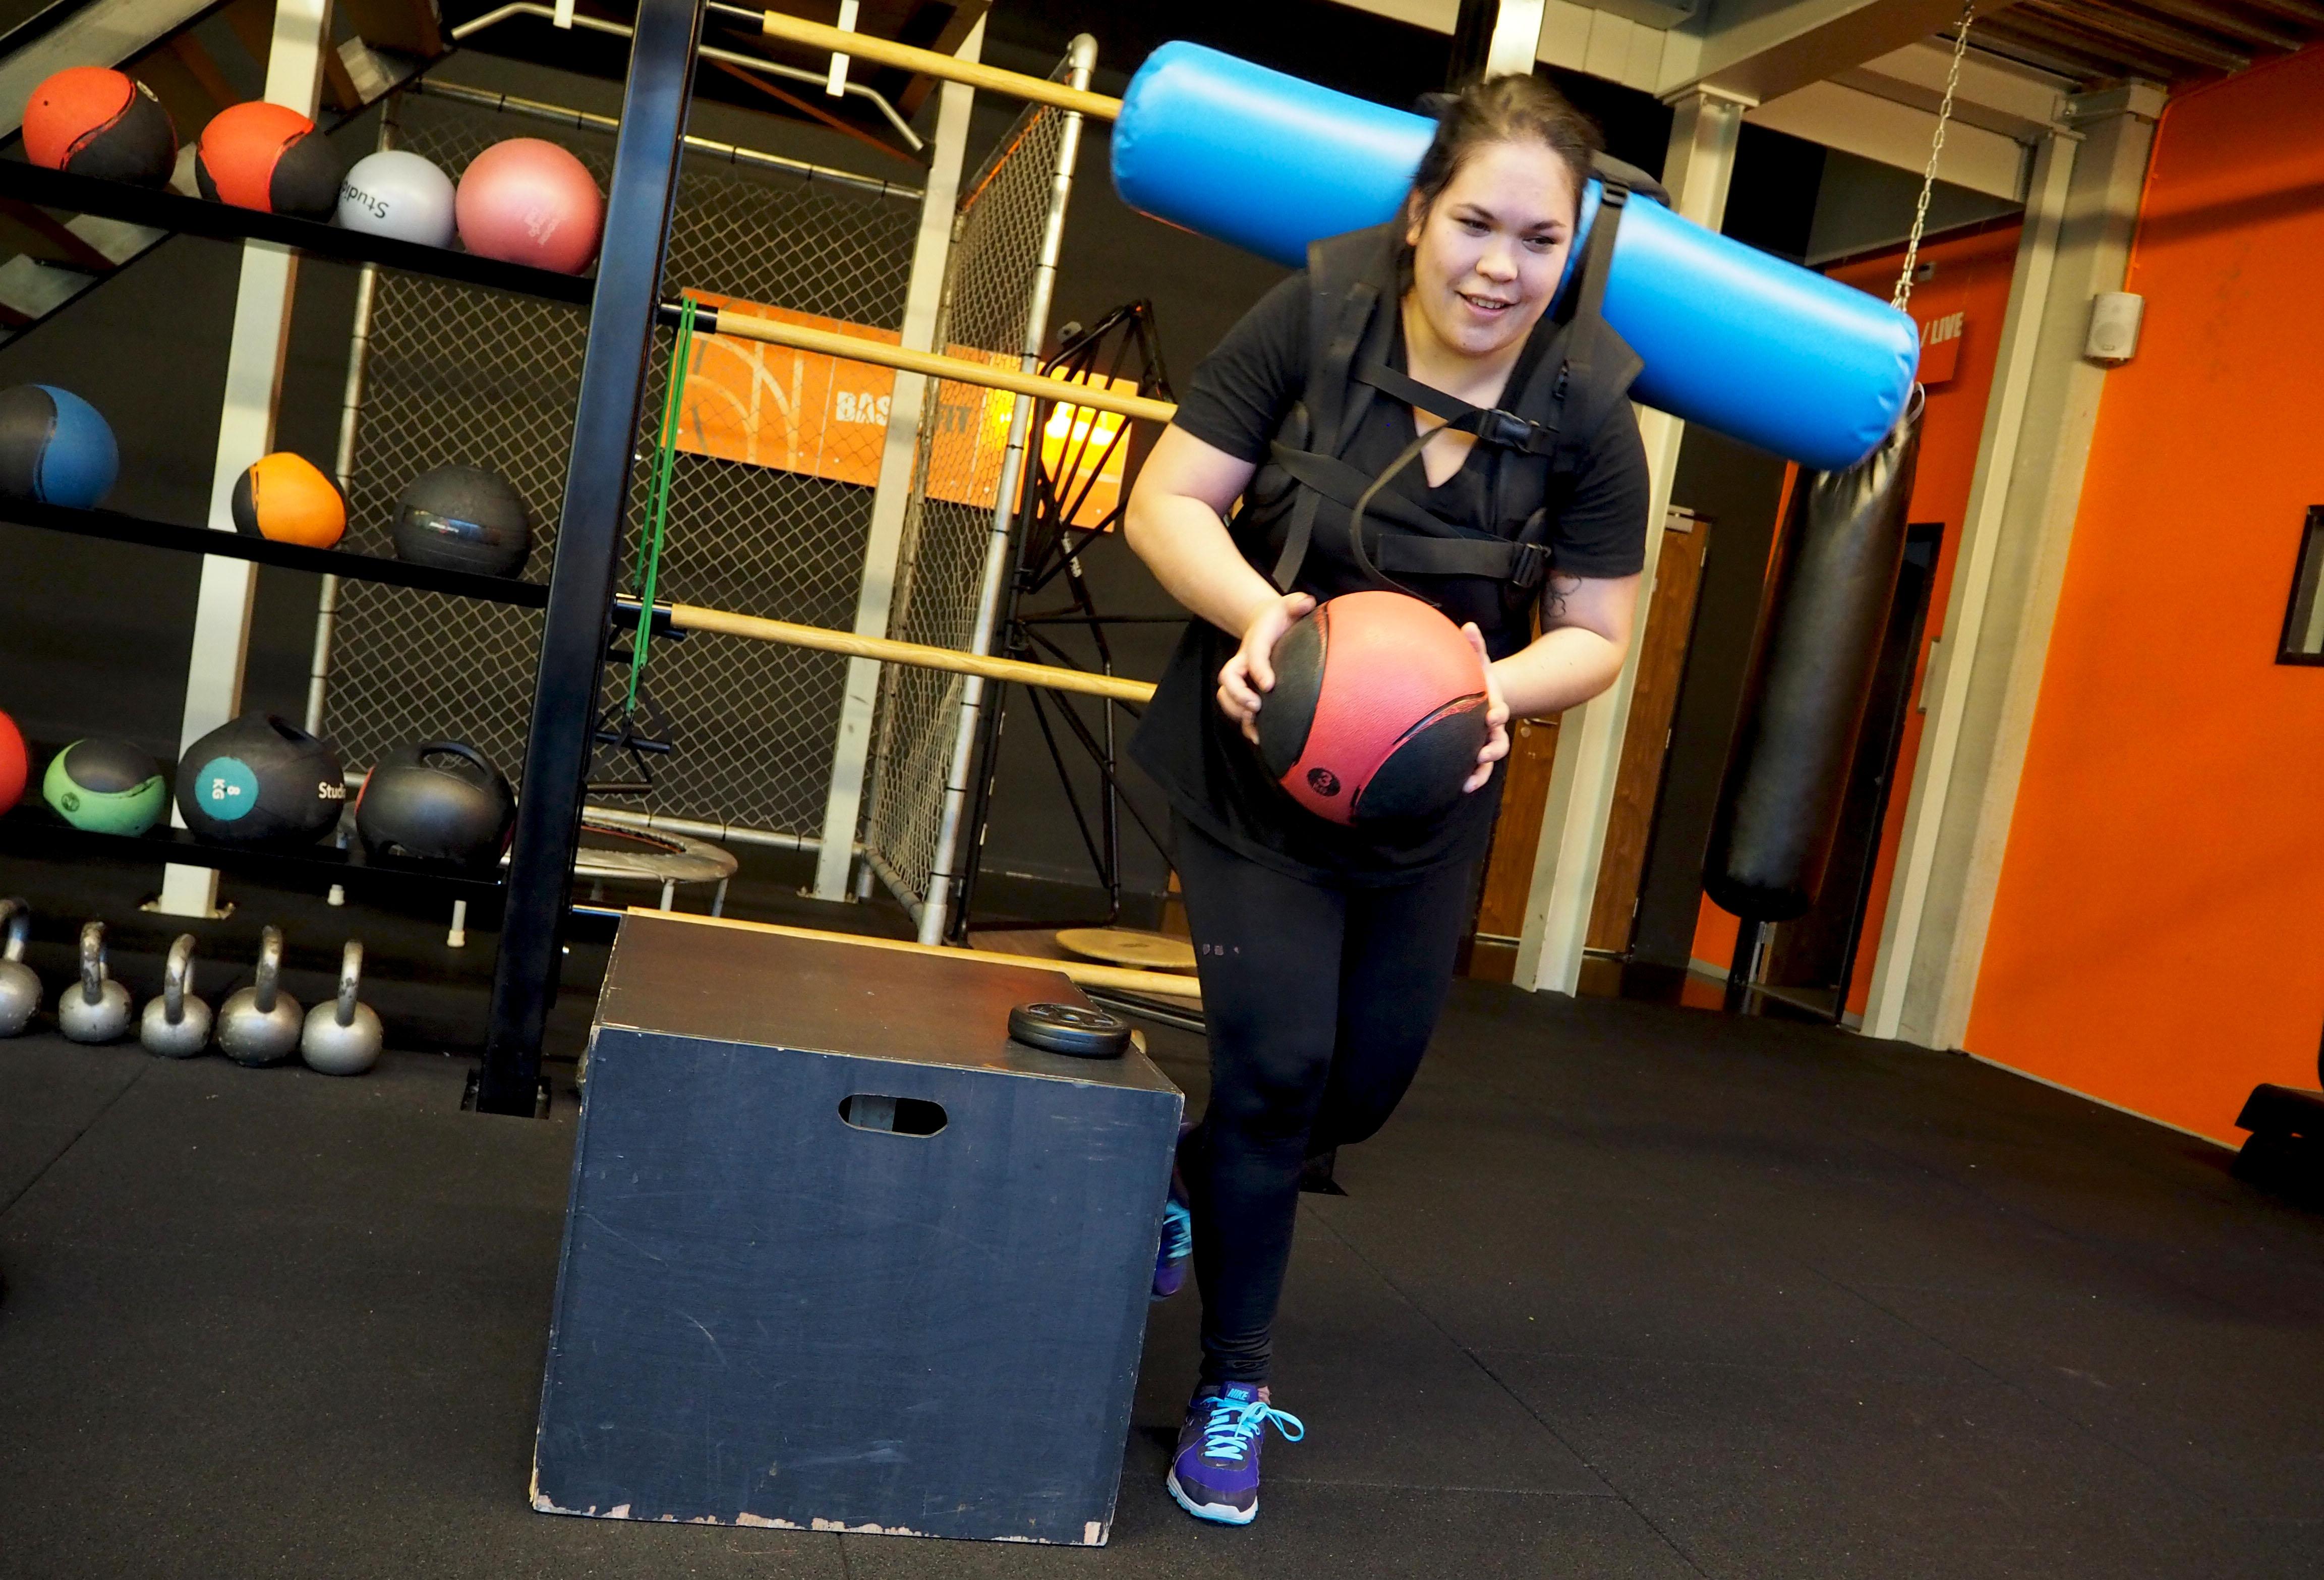 aqua bags BFIT personal training